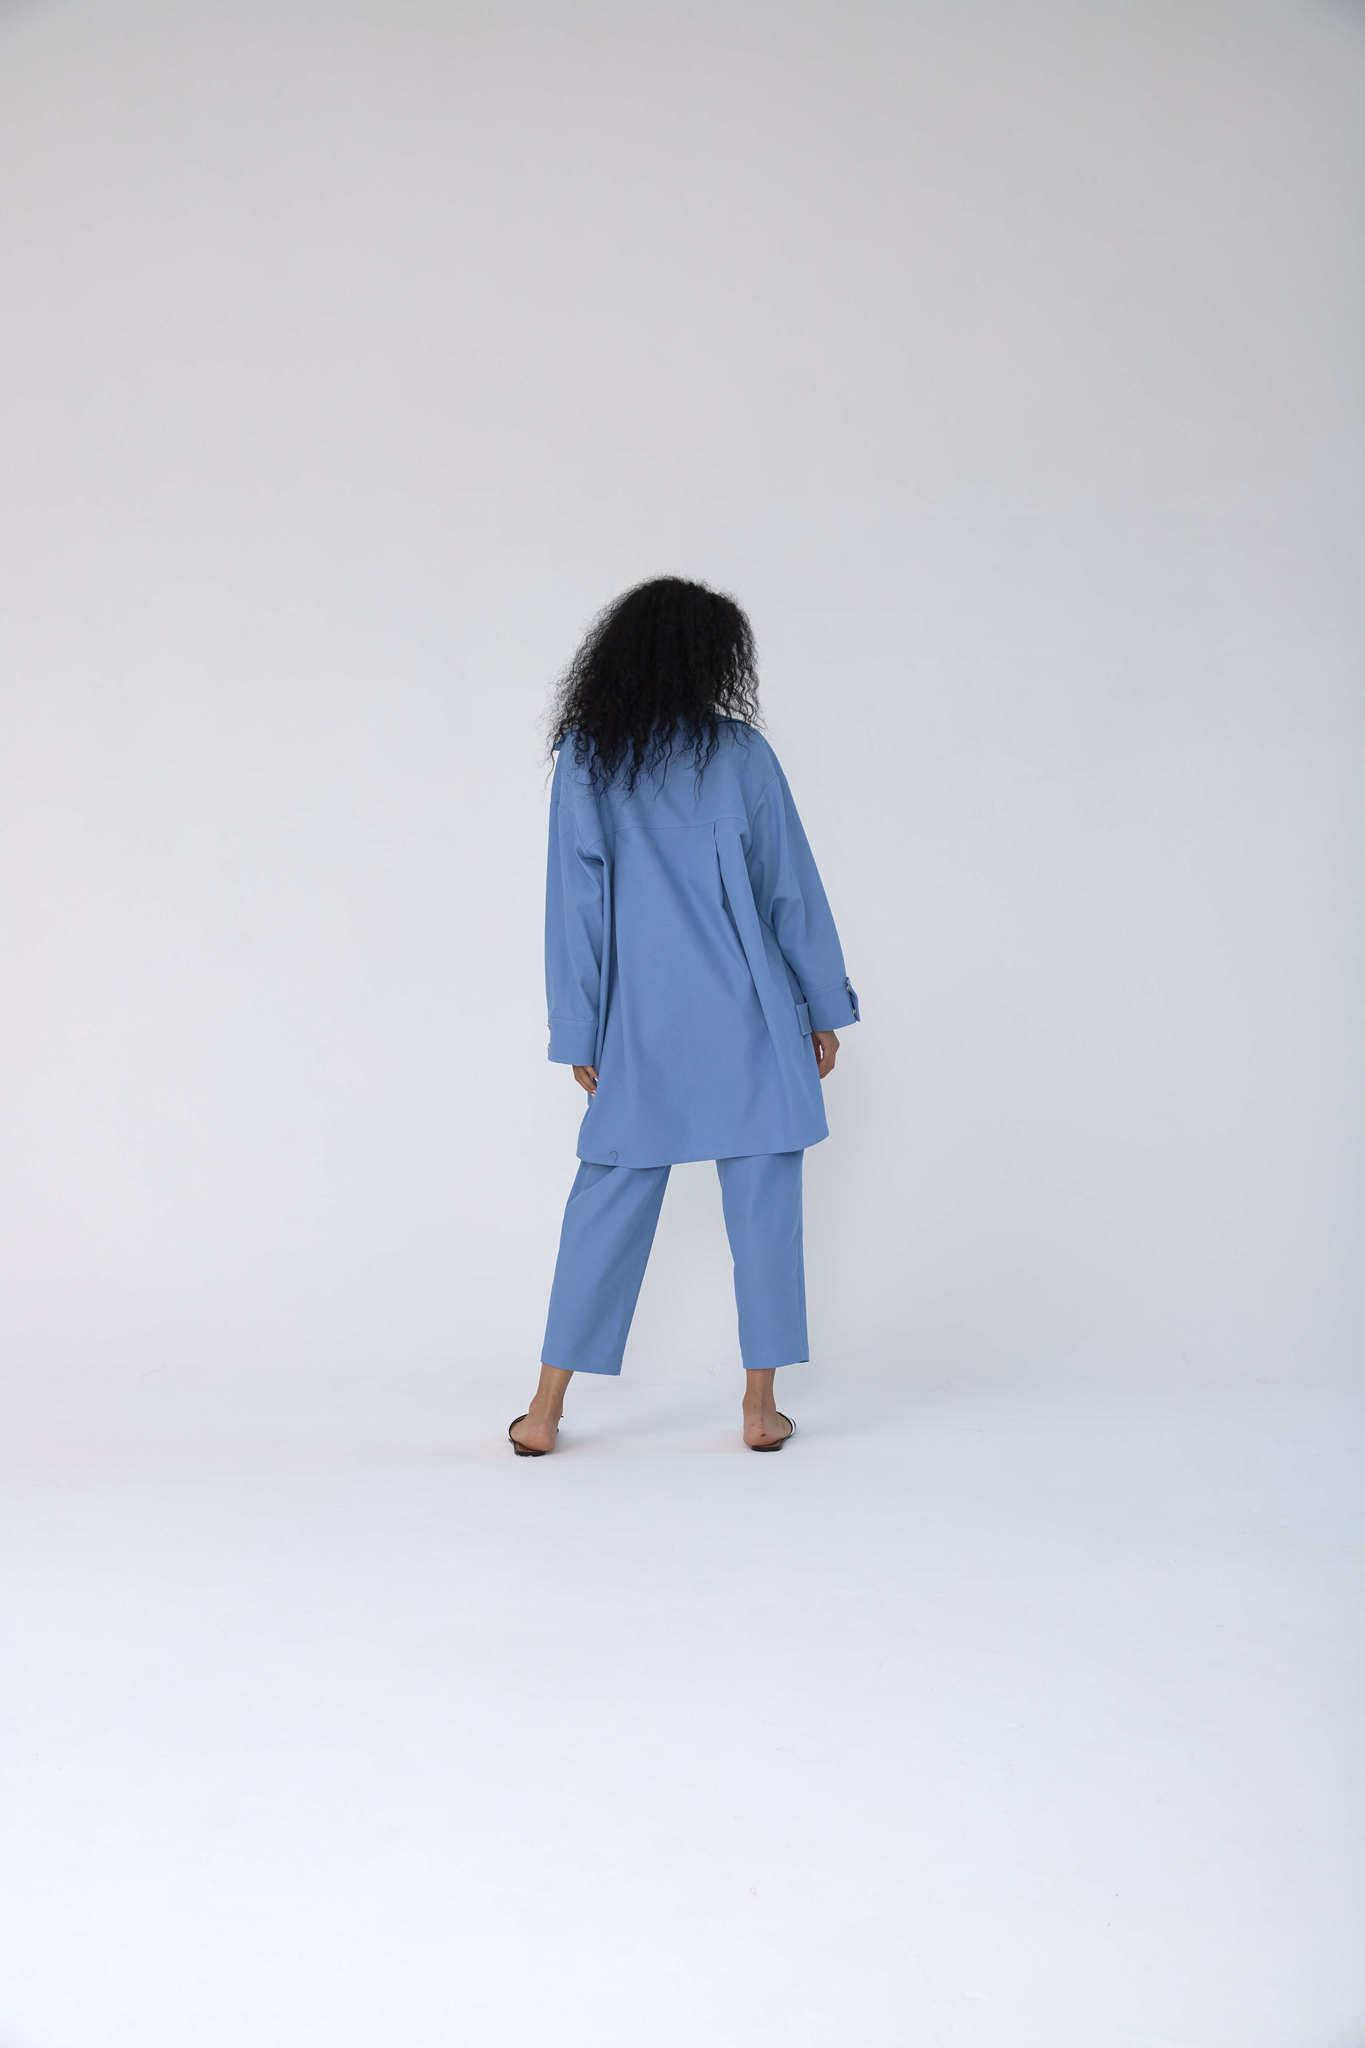 Куртка-рубашка на кнопках из денима, небесно-голубая